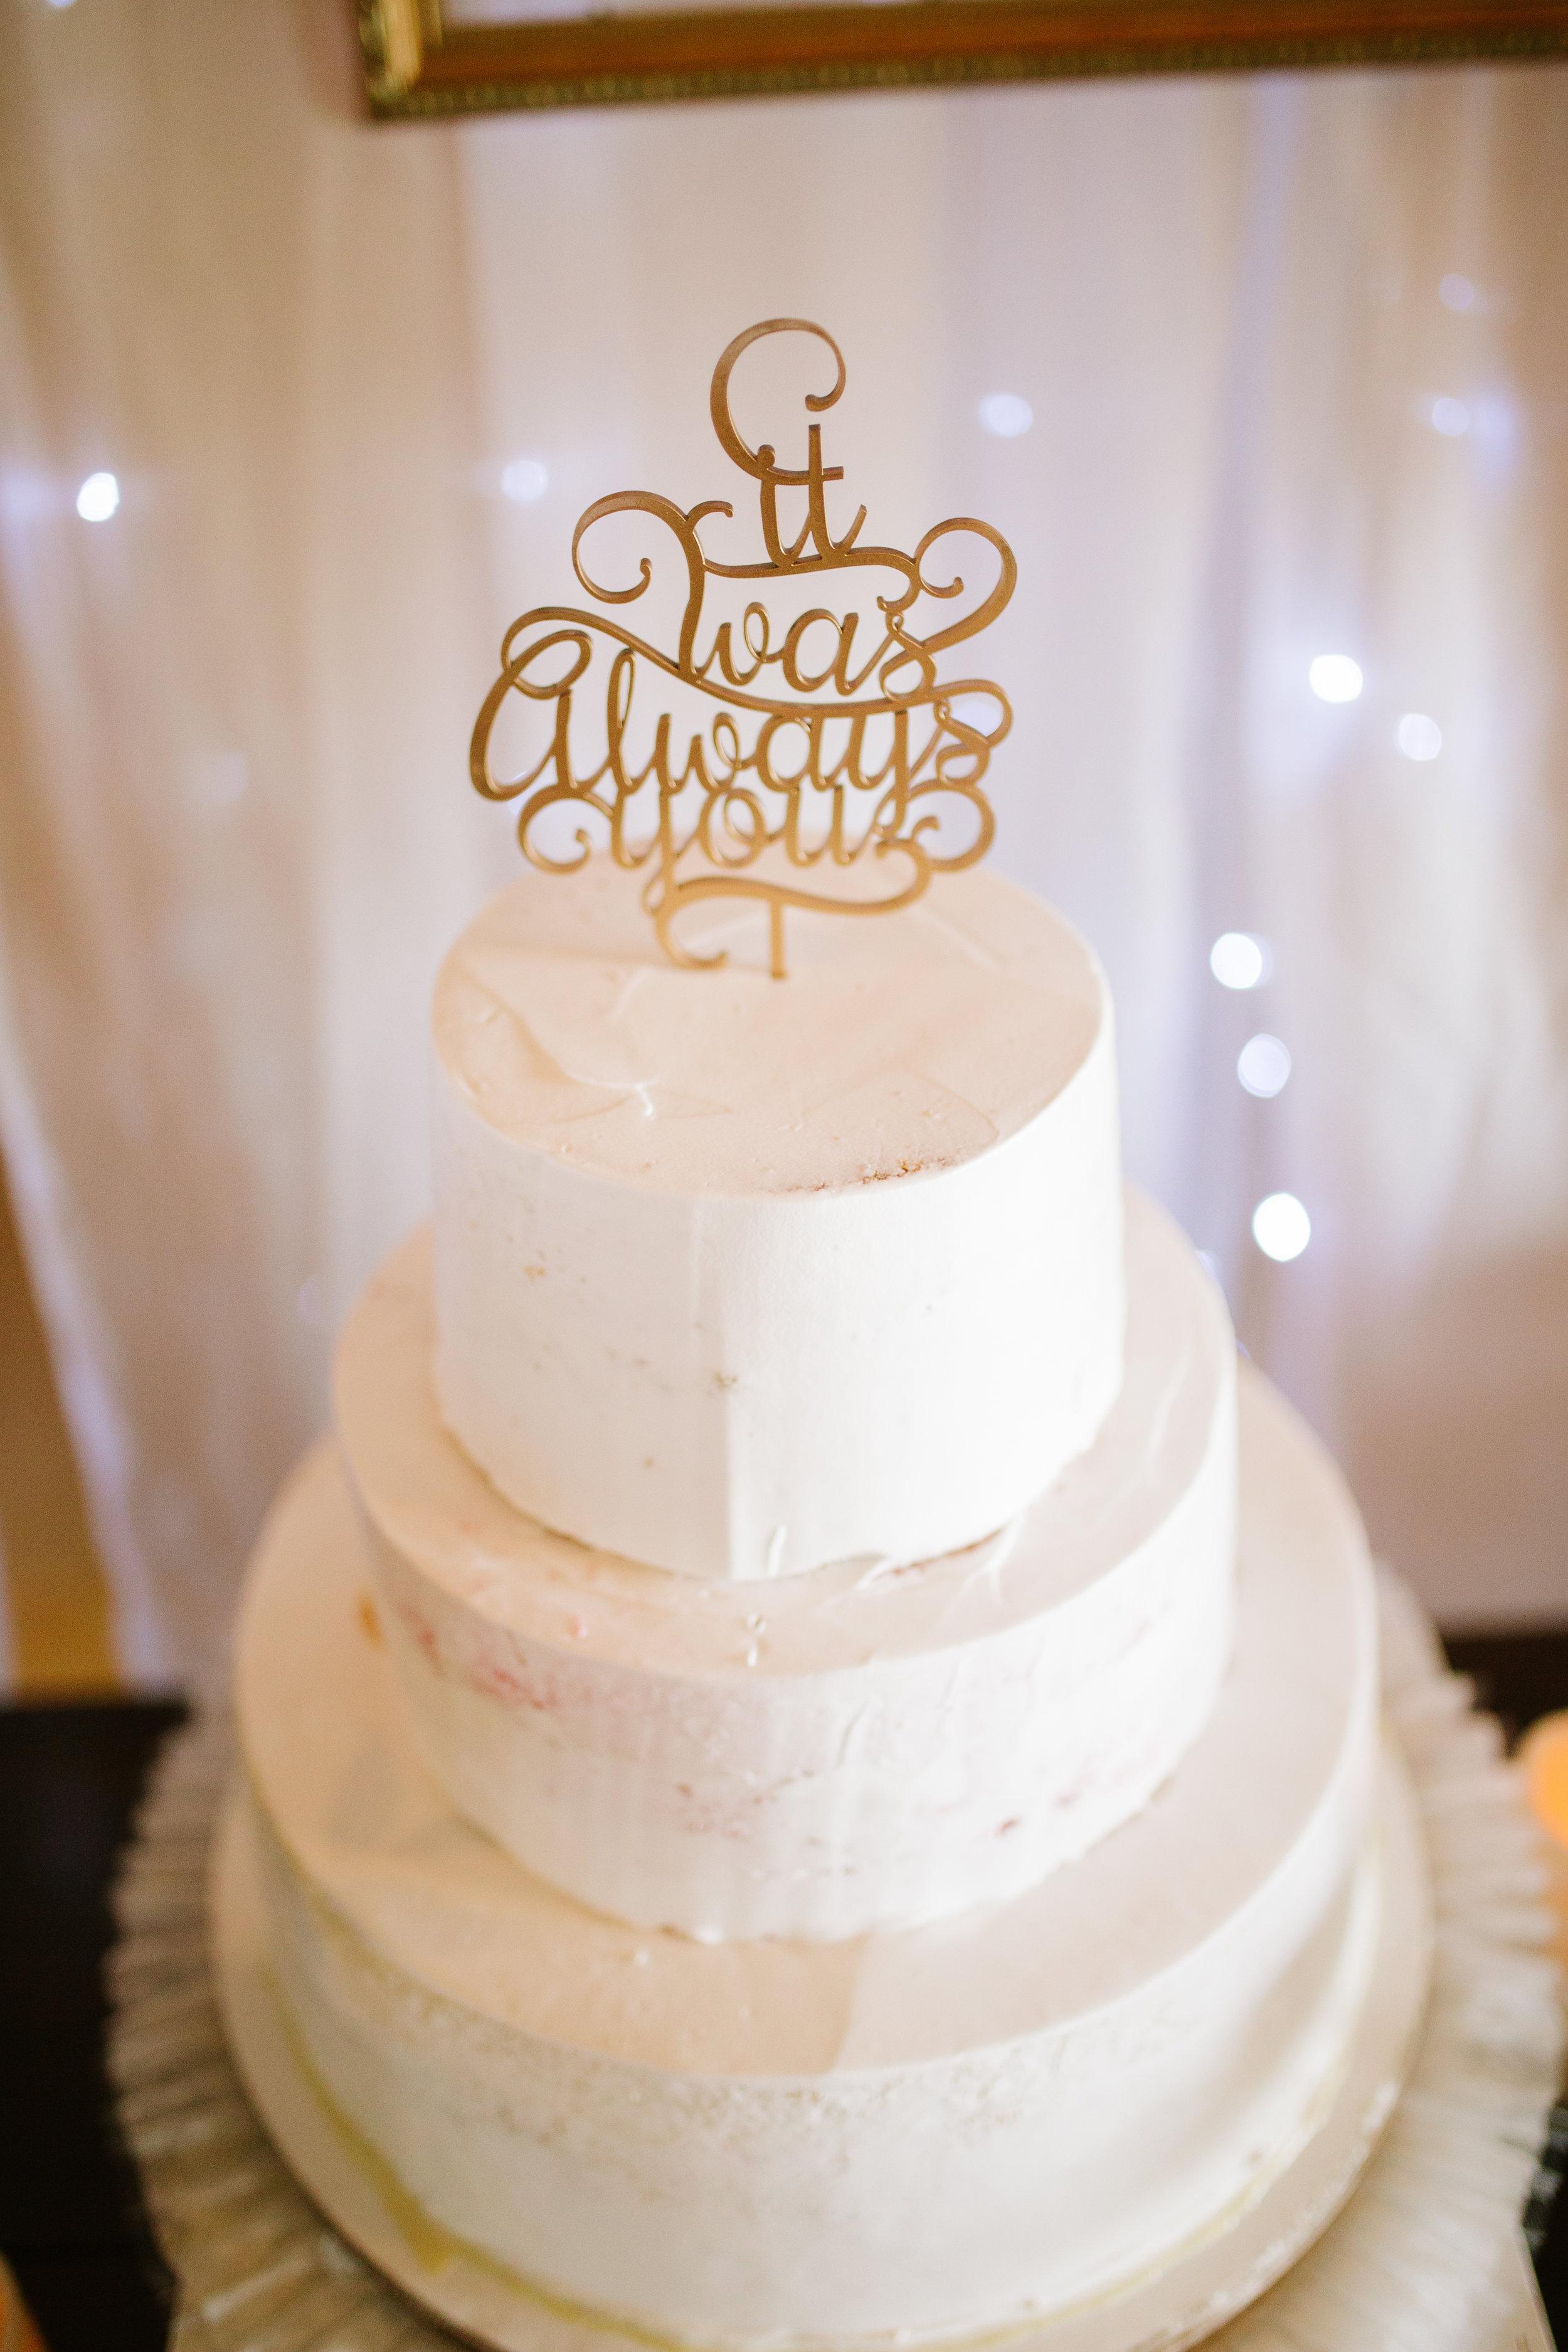 2017.05.23 Barbara and Mauricio Sales Port St Lucie Wedding (114 of 772).jpg